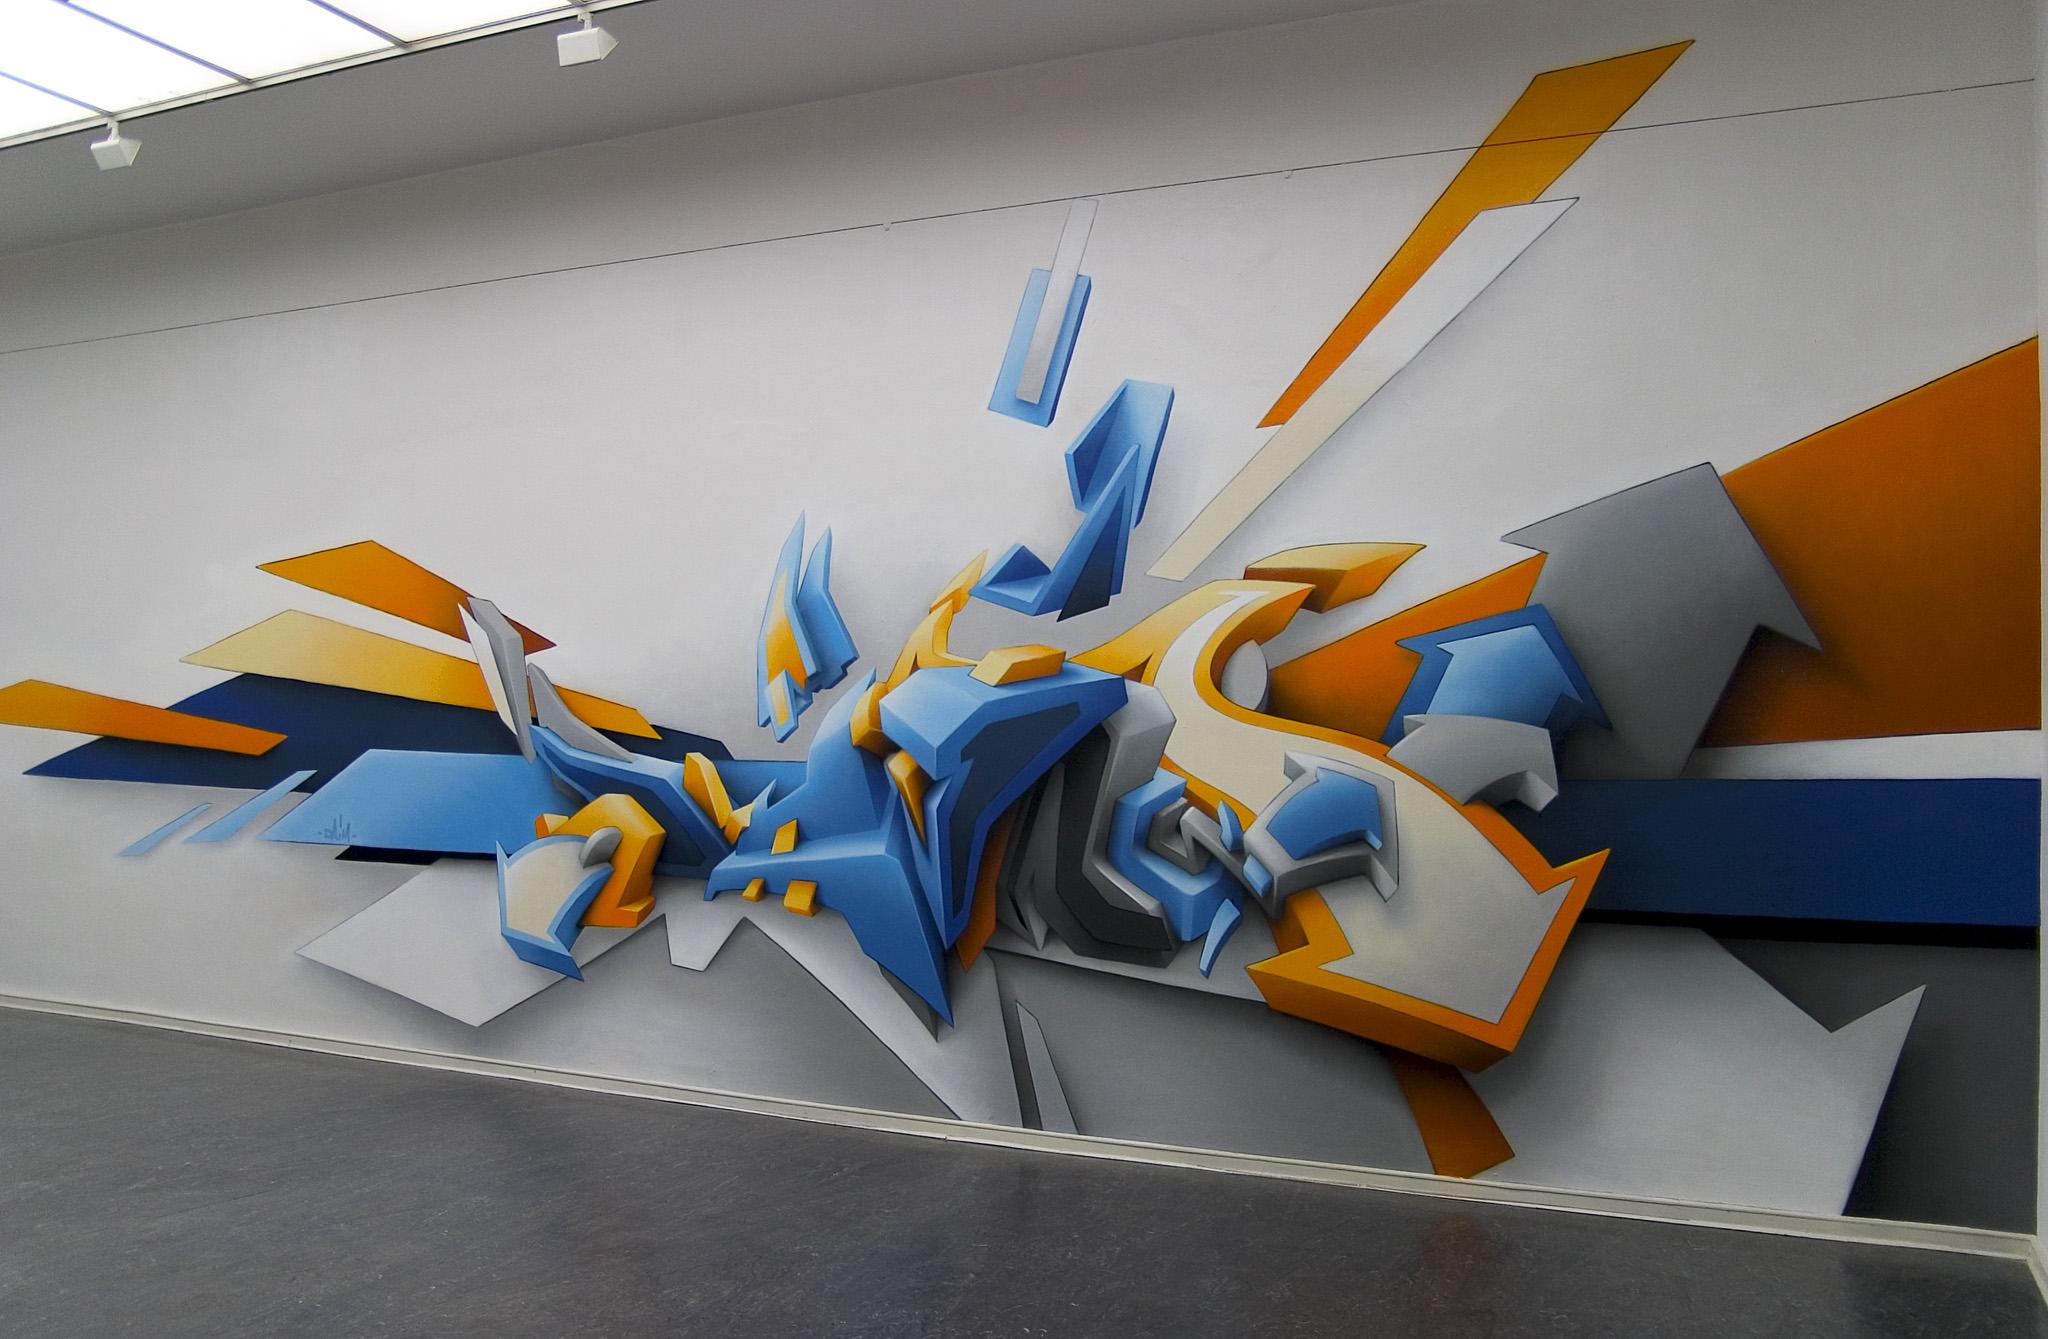 Artistic - Graffiti - Junlia - George Wallpaper